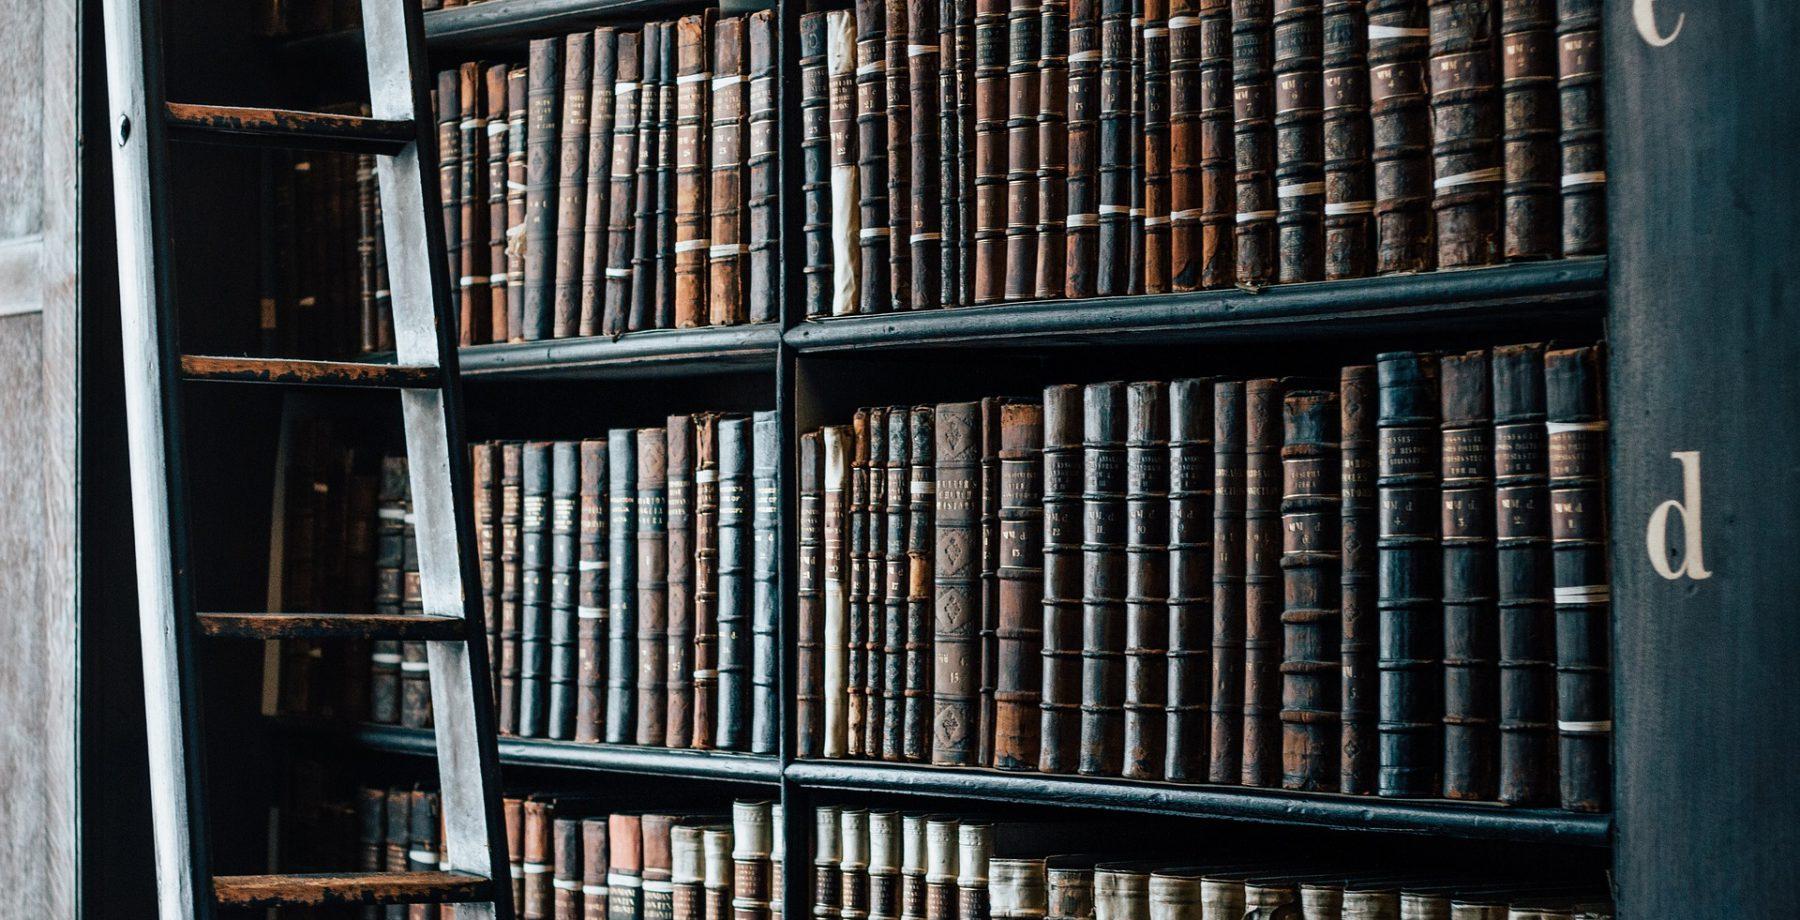 03_bookshelf-1082309_1920